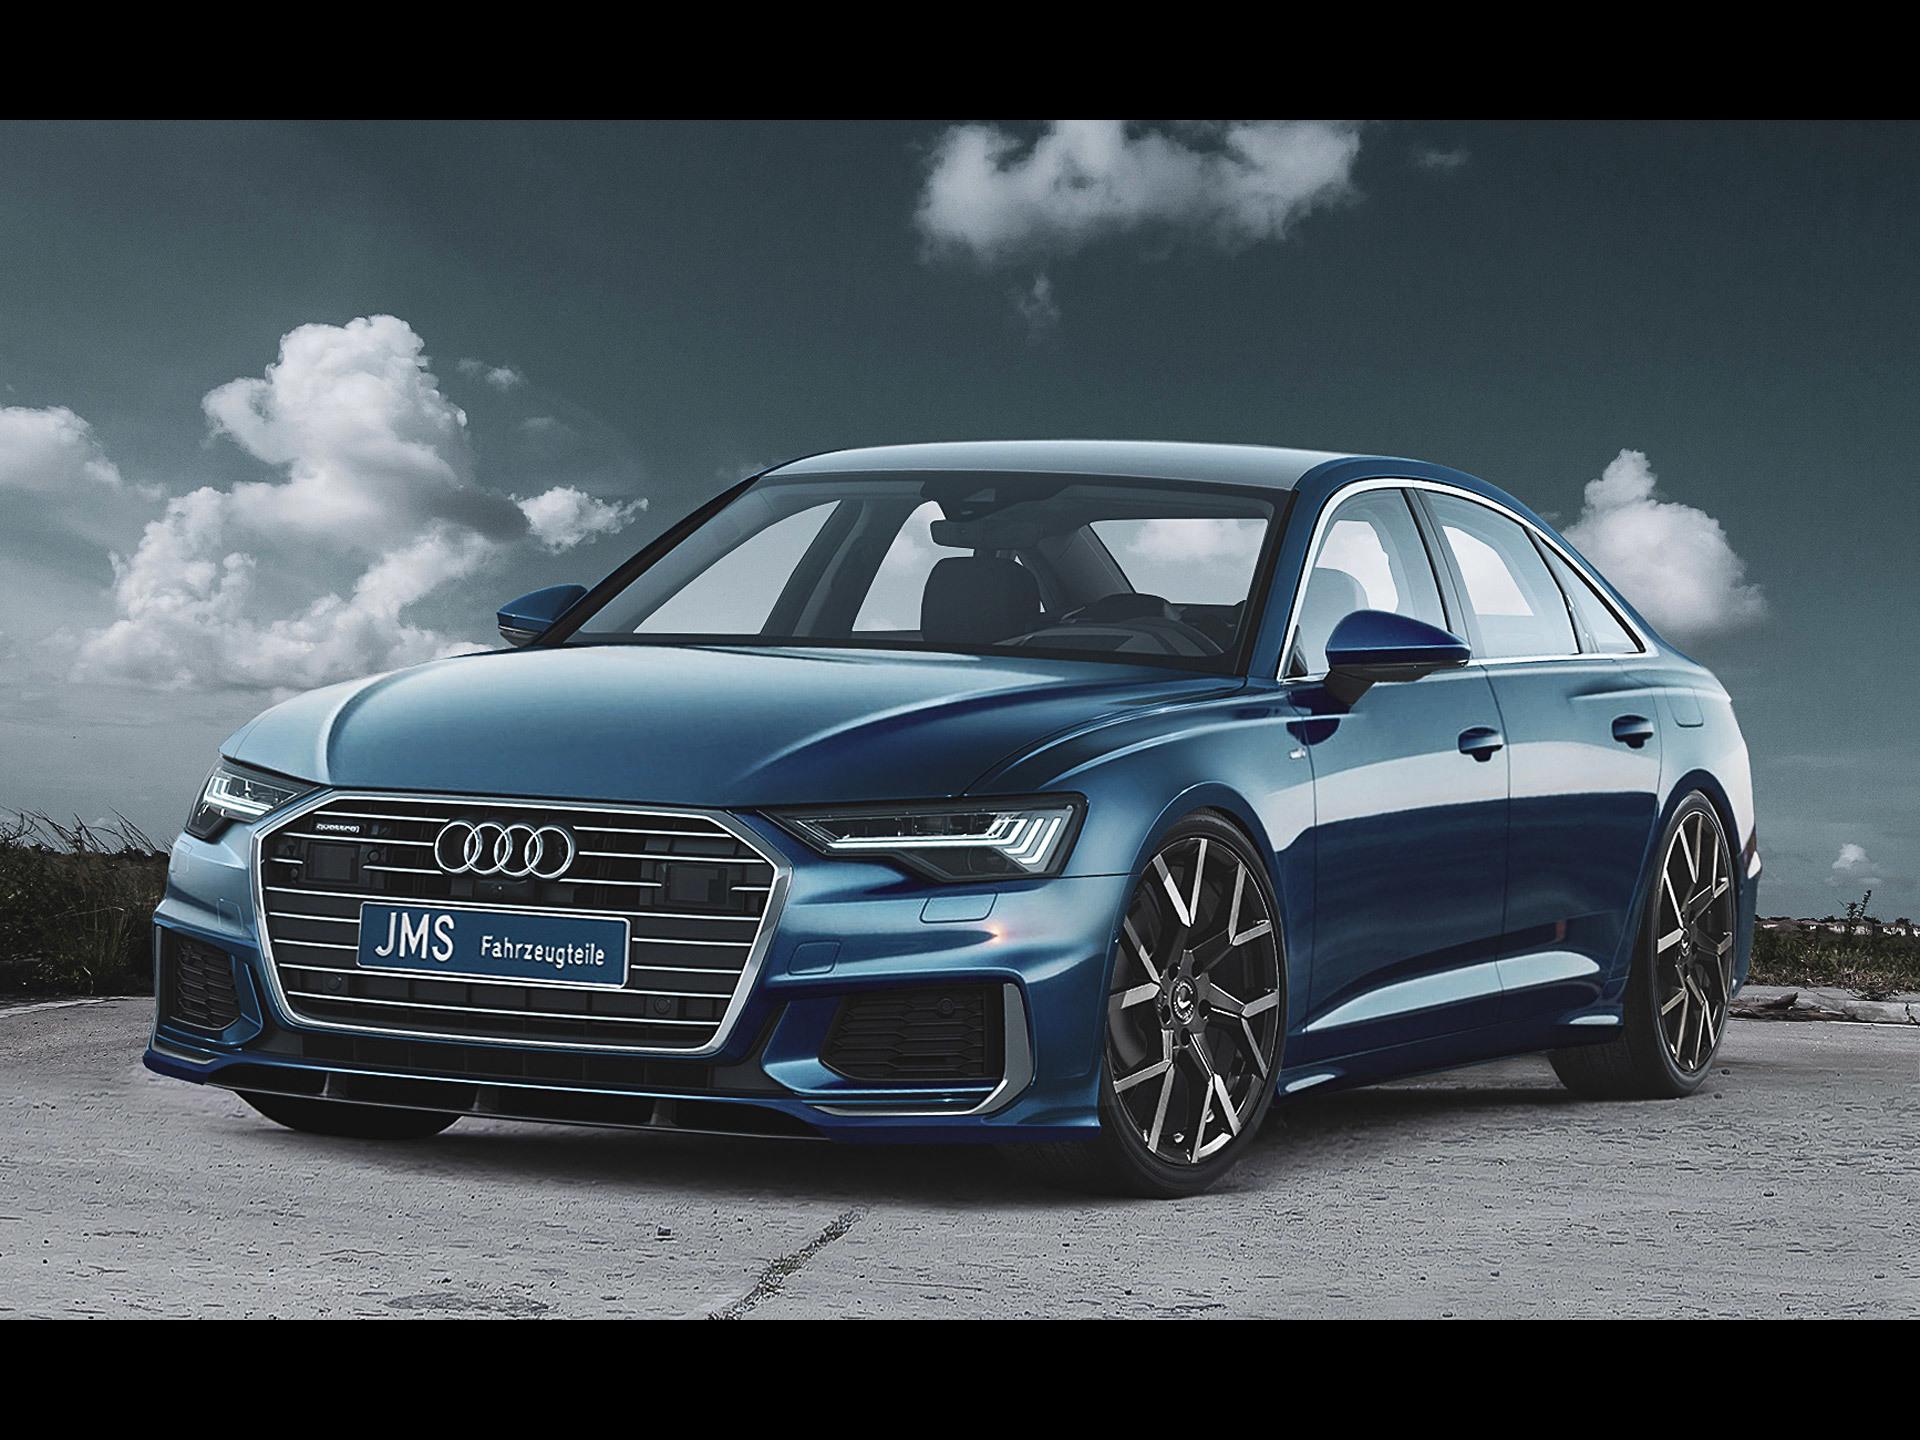 JMS Audi A6 Sedan S line [2019] - アウディに嵌まる - 壁紙画像ブログ